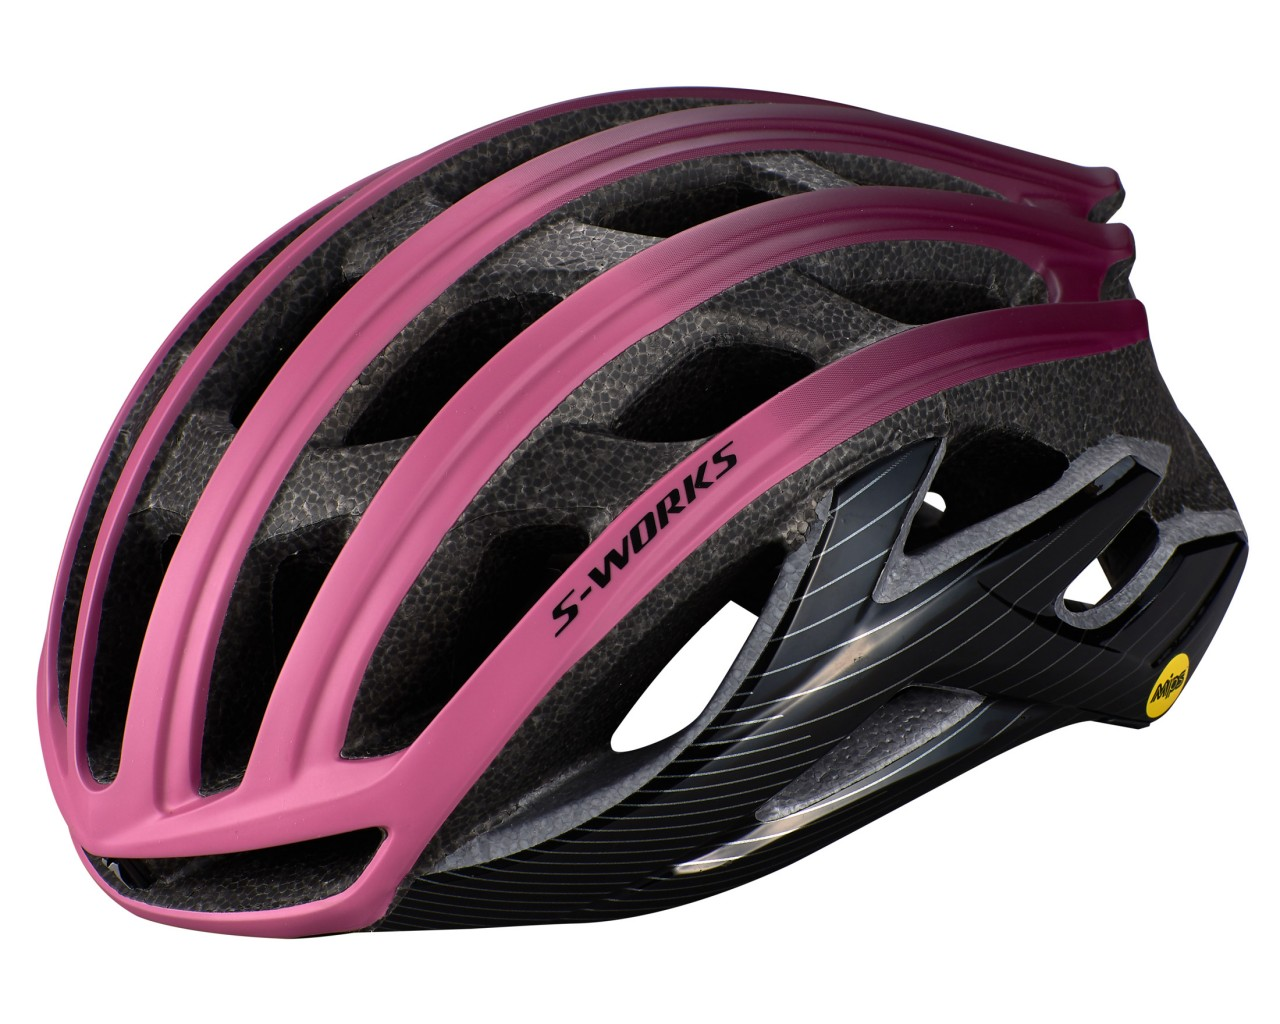 Specialized S-Works Prevail II Road Bike Helmet ANGi ready & MIPS | cast berry-dusty lilac